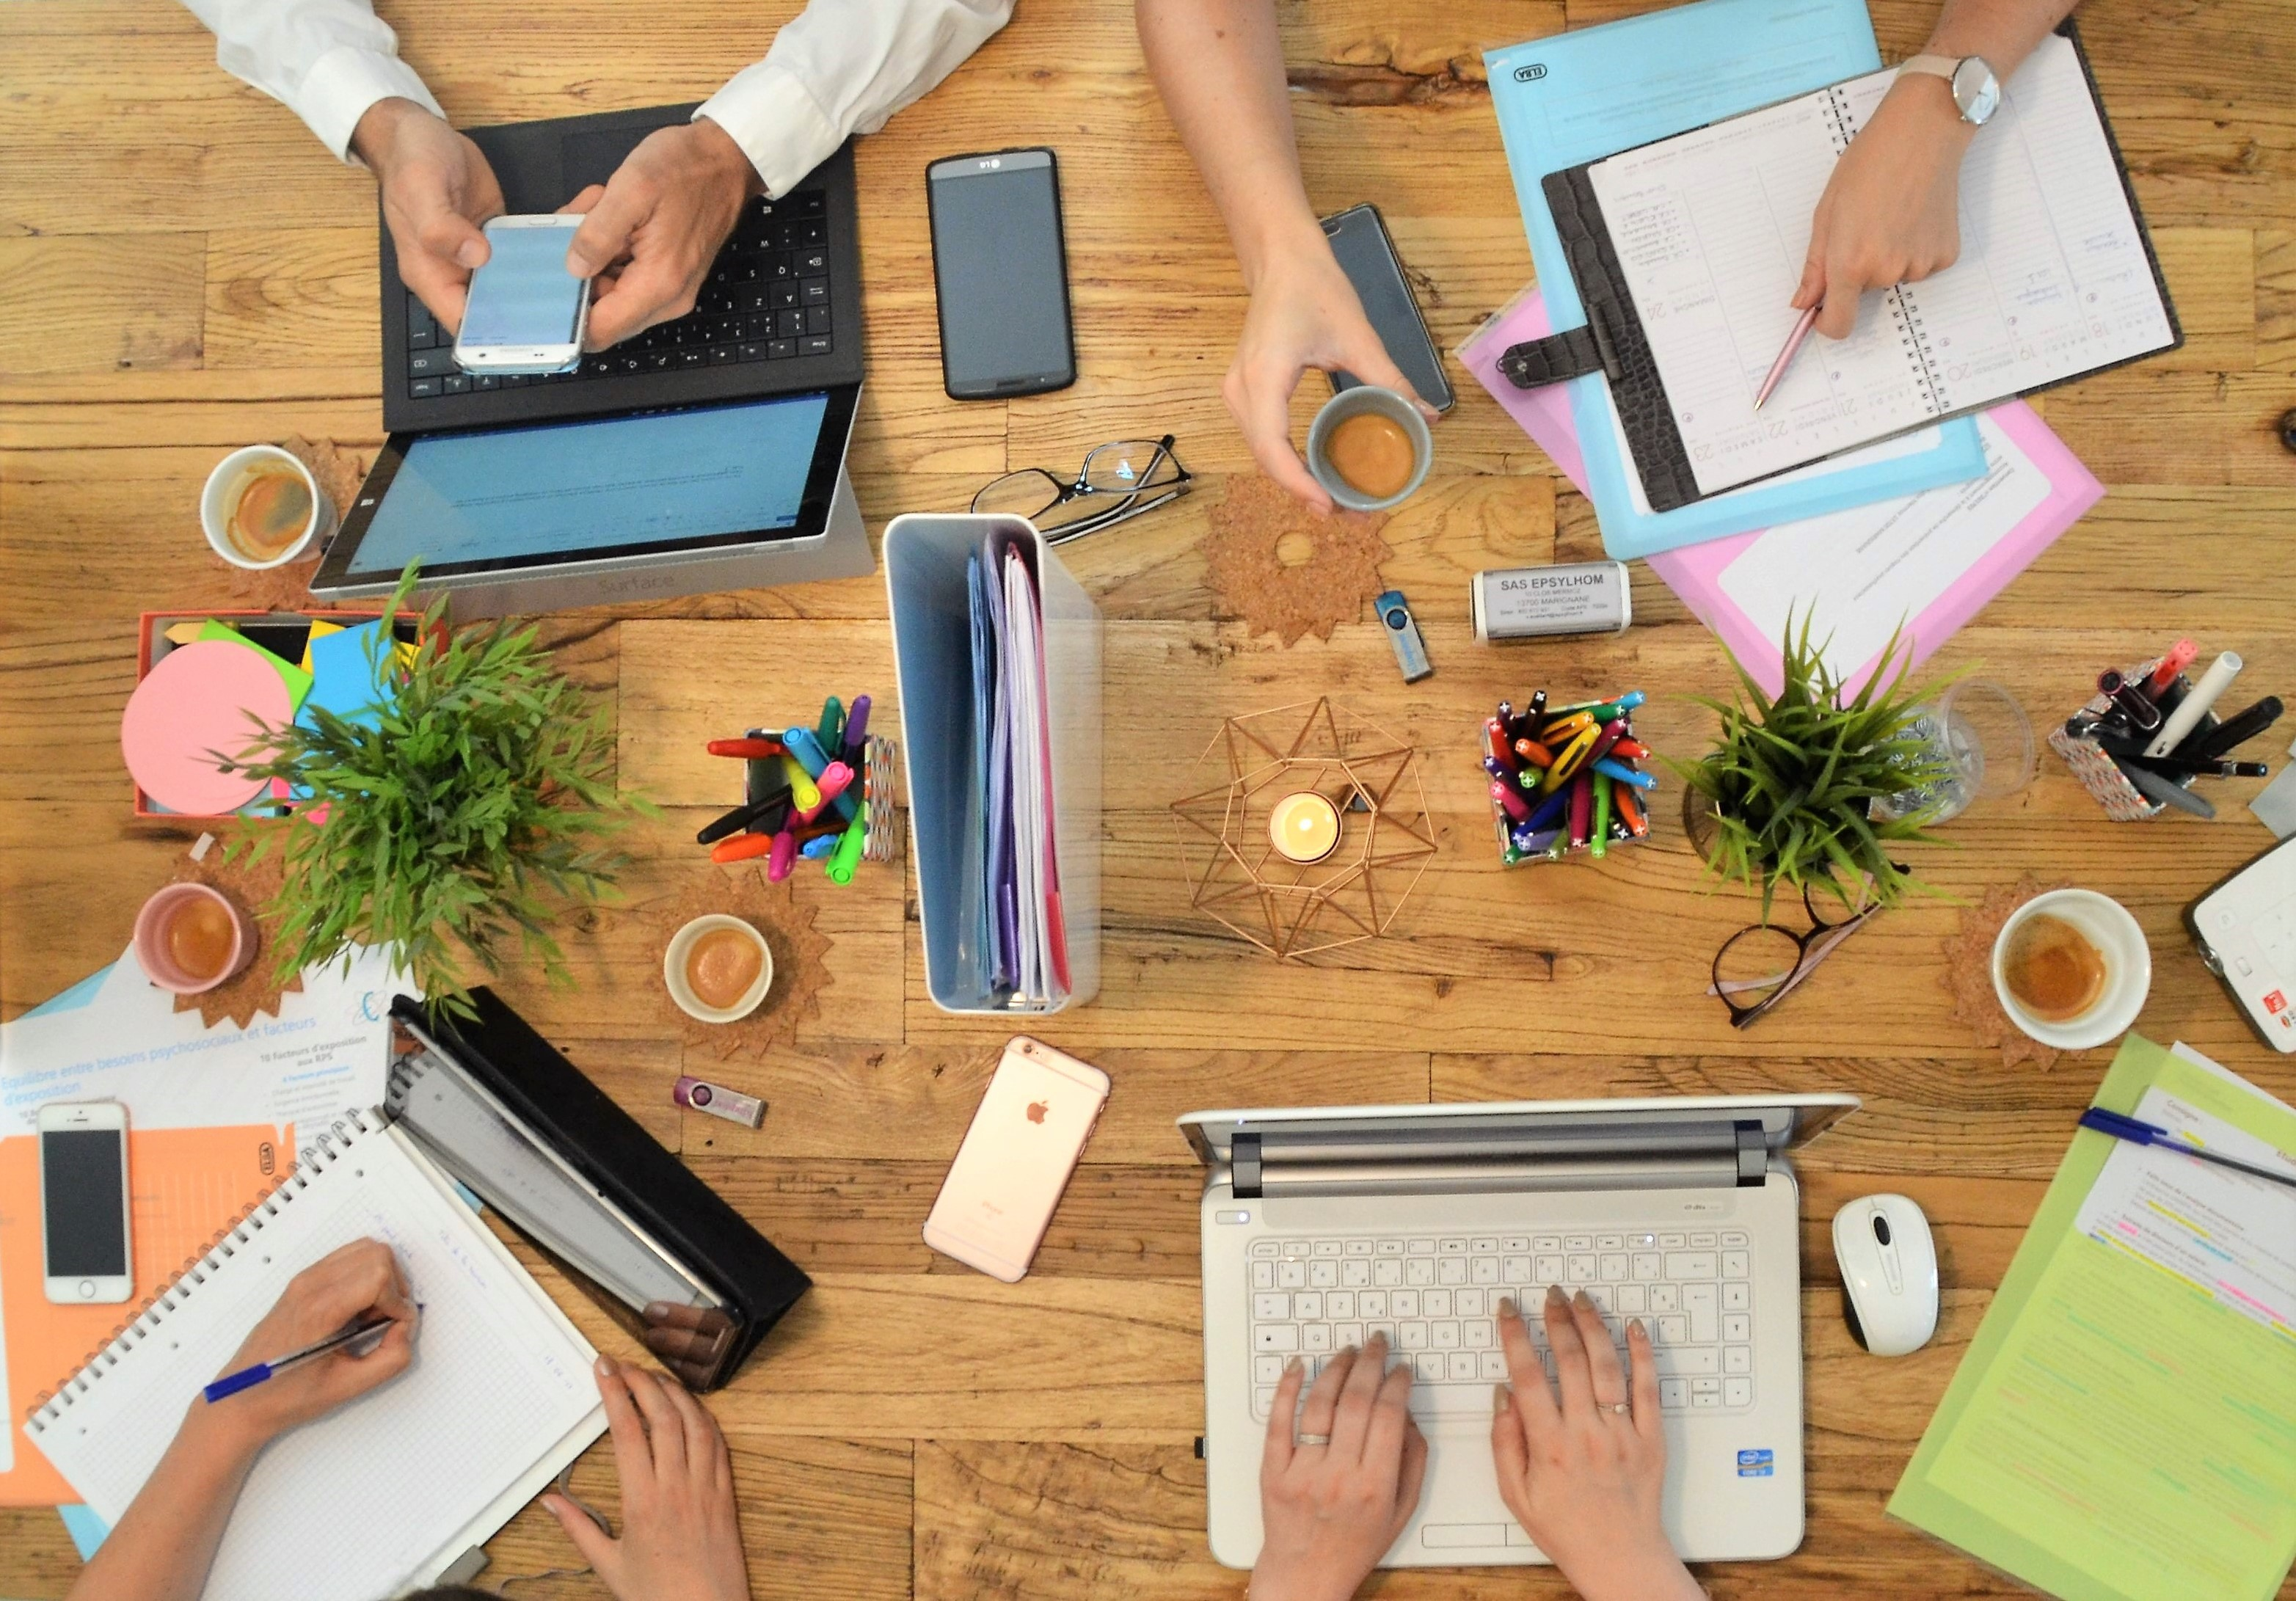 bureau espace de travail collectif